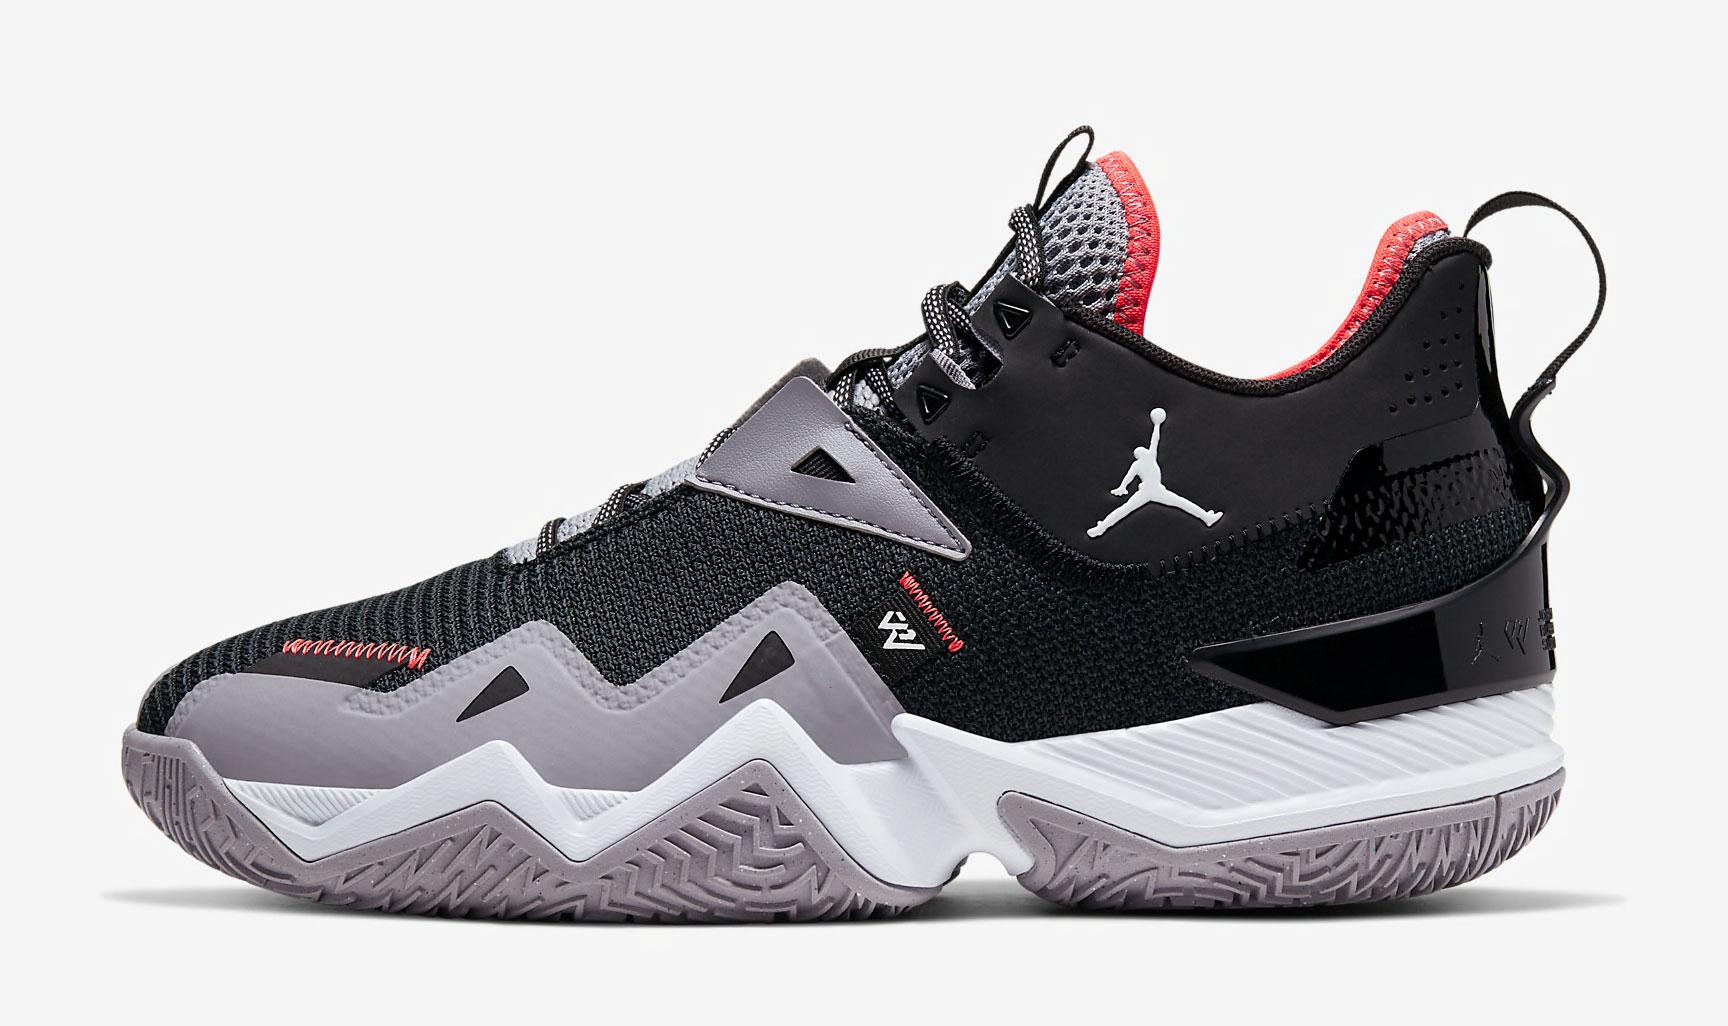 jordan-westbrook-one-take-black-cement-grey-release-date